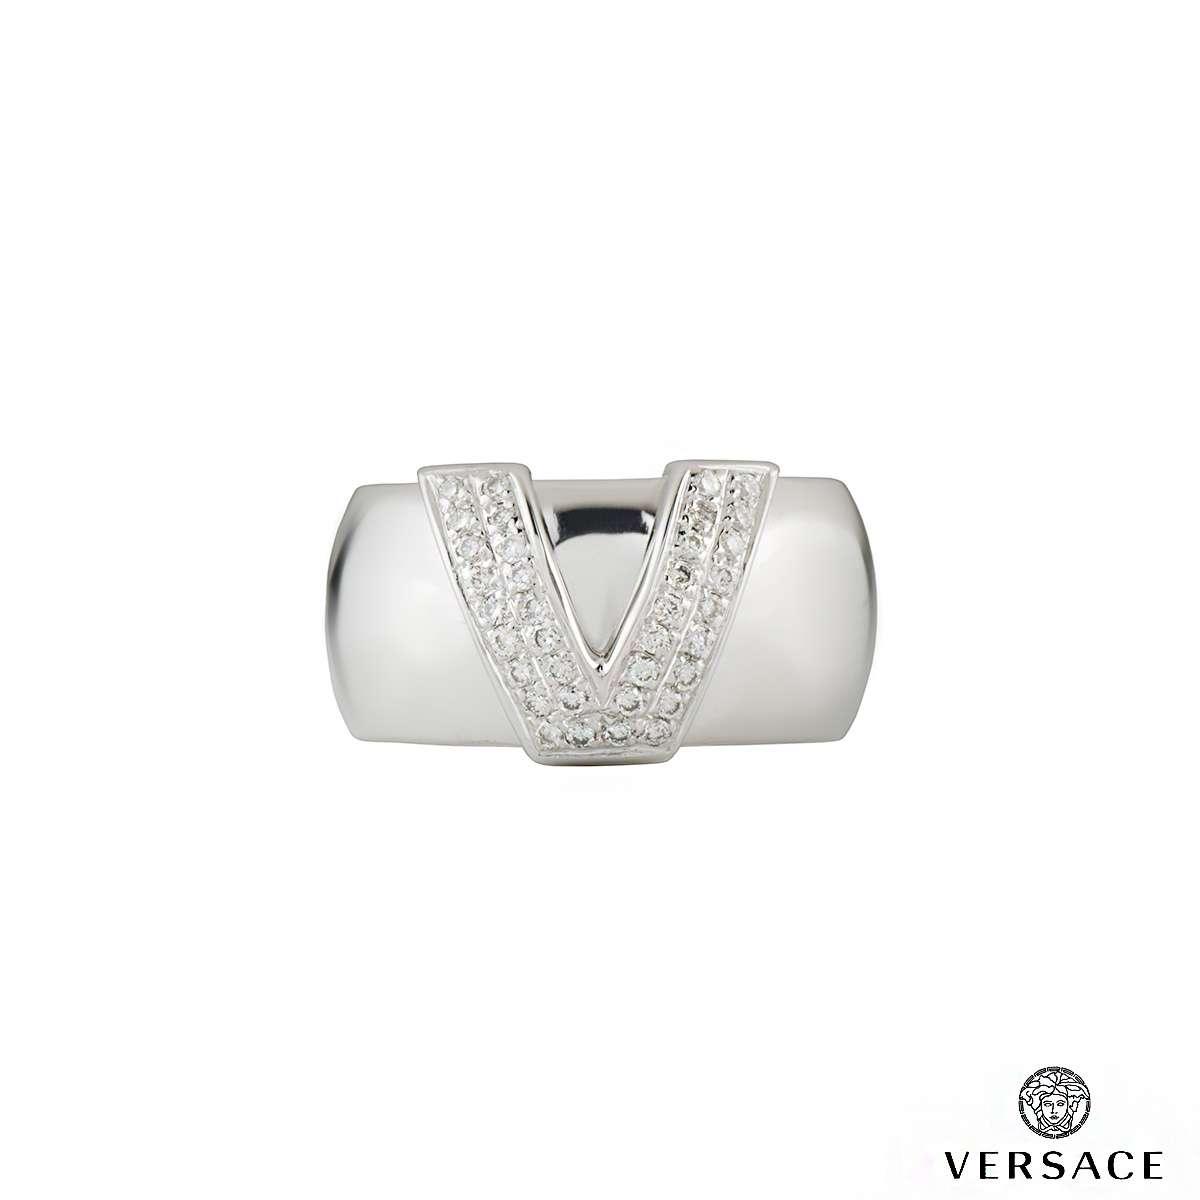 Versace 18k White Gold Ring